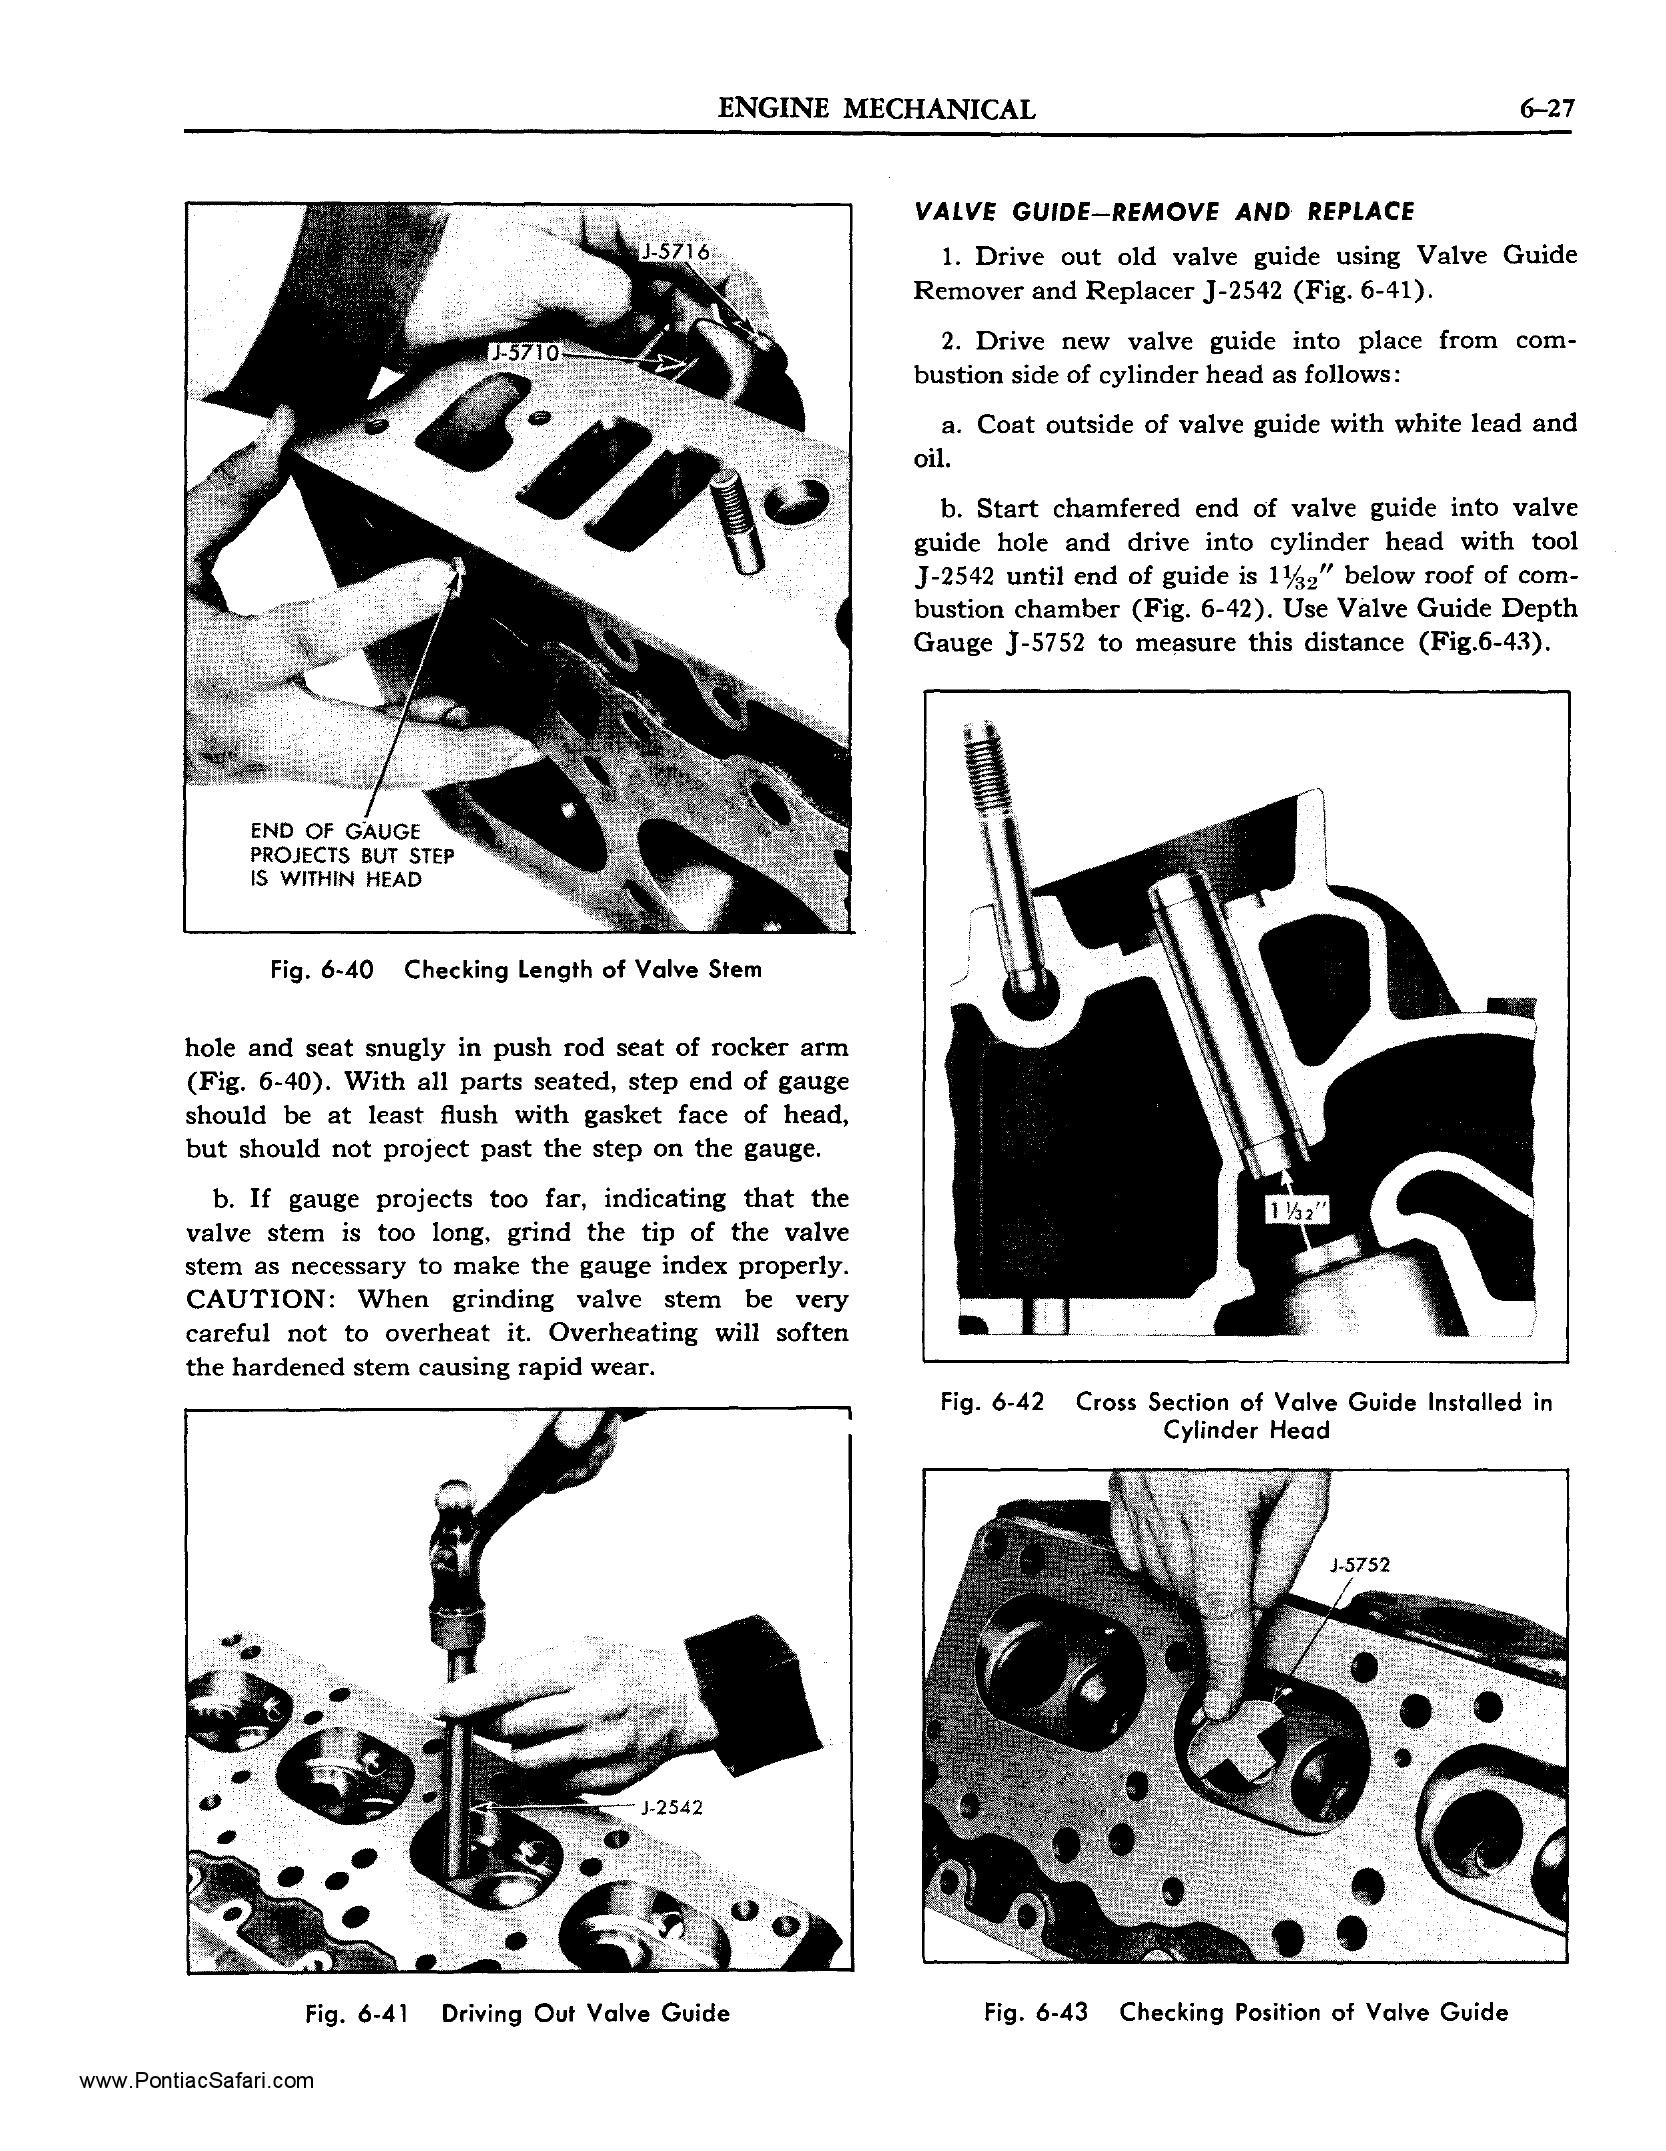 1955 Pontiac Shop Manual- Engine Mechanical Page 28 of 53